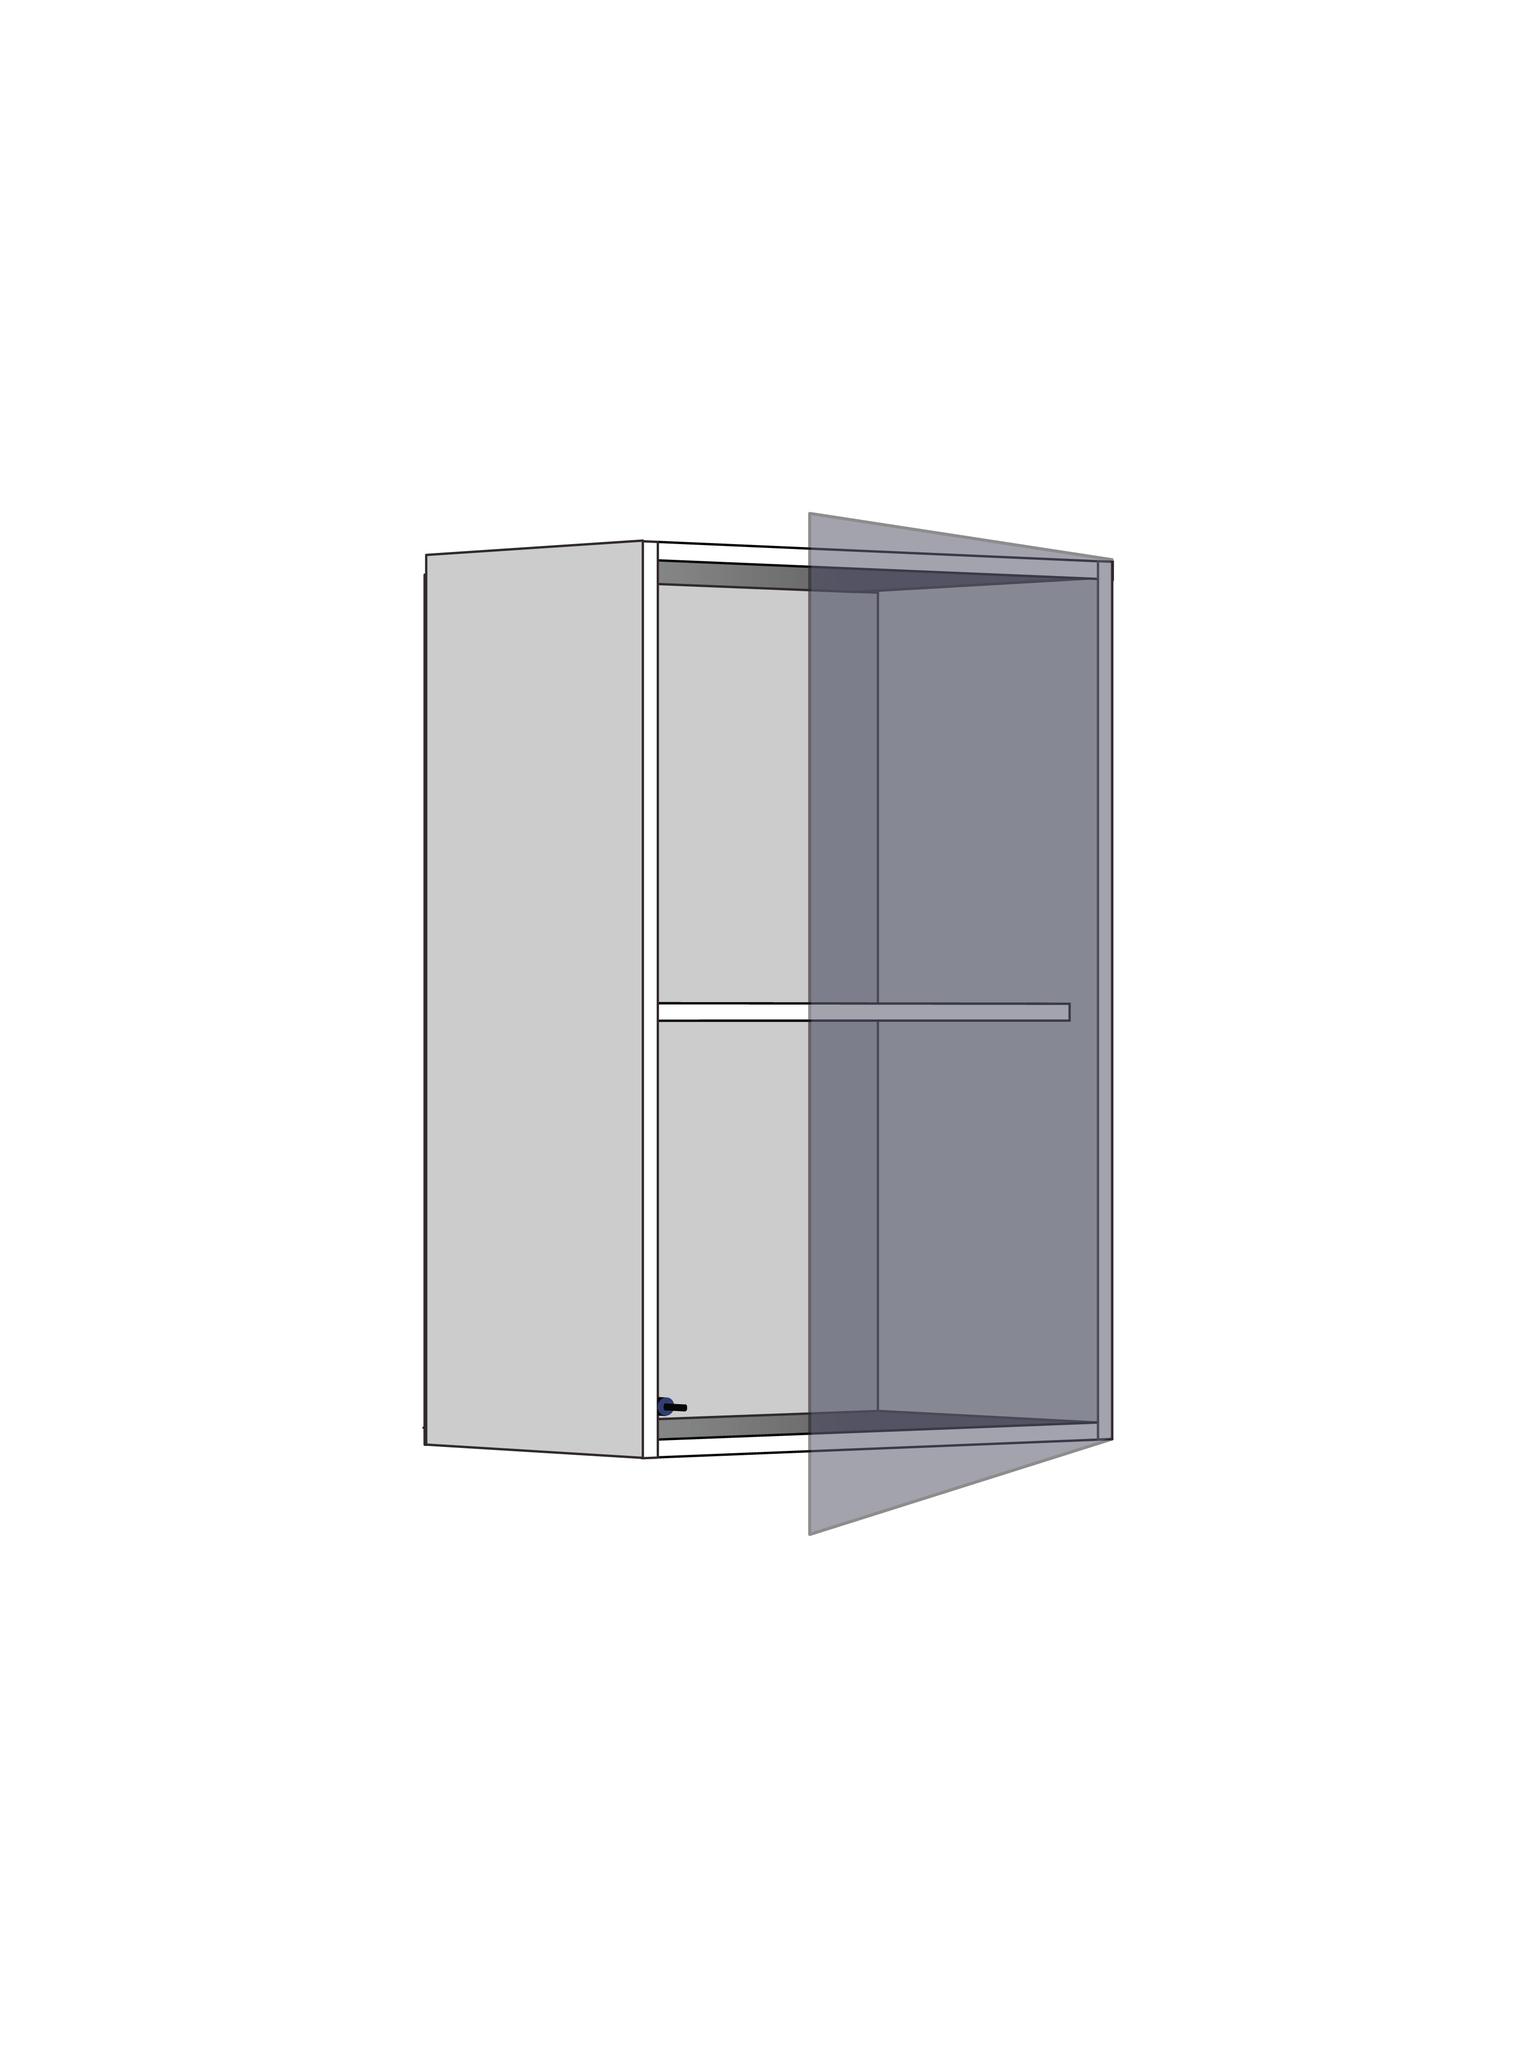 Верхний шкаф c полкой, 720Х450 мм / PushToOpen